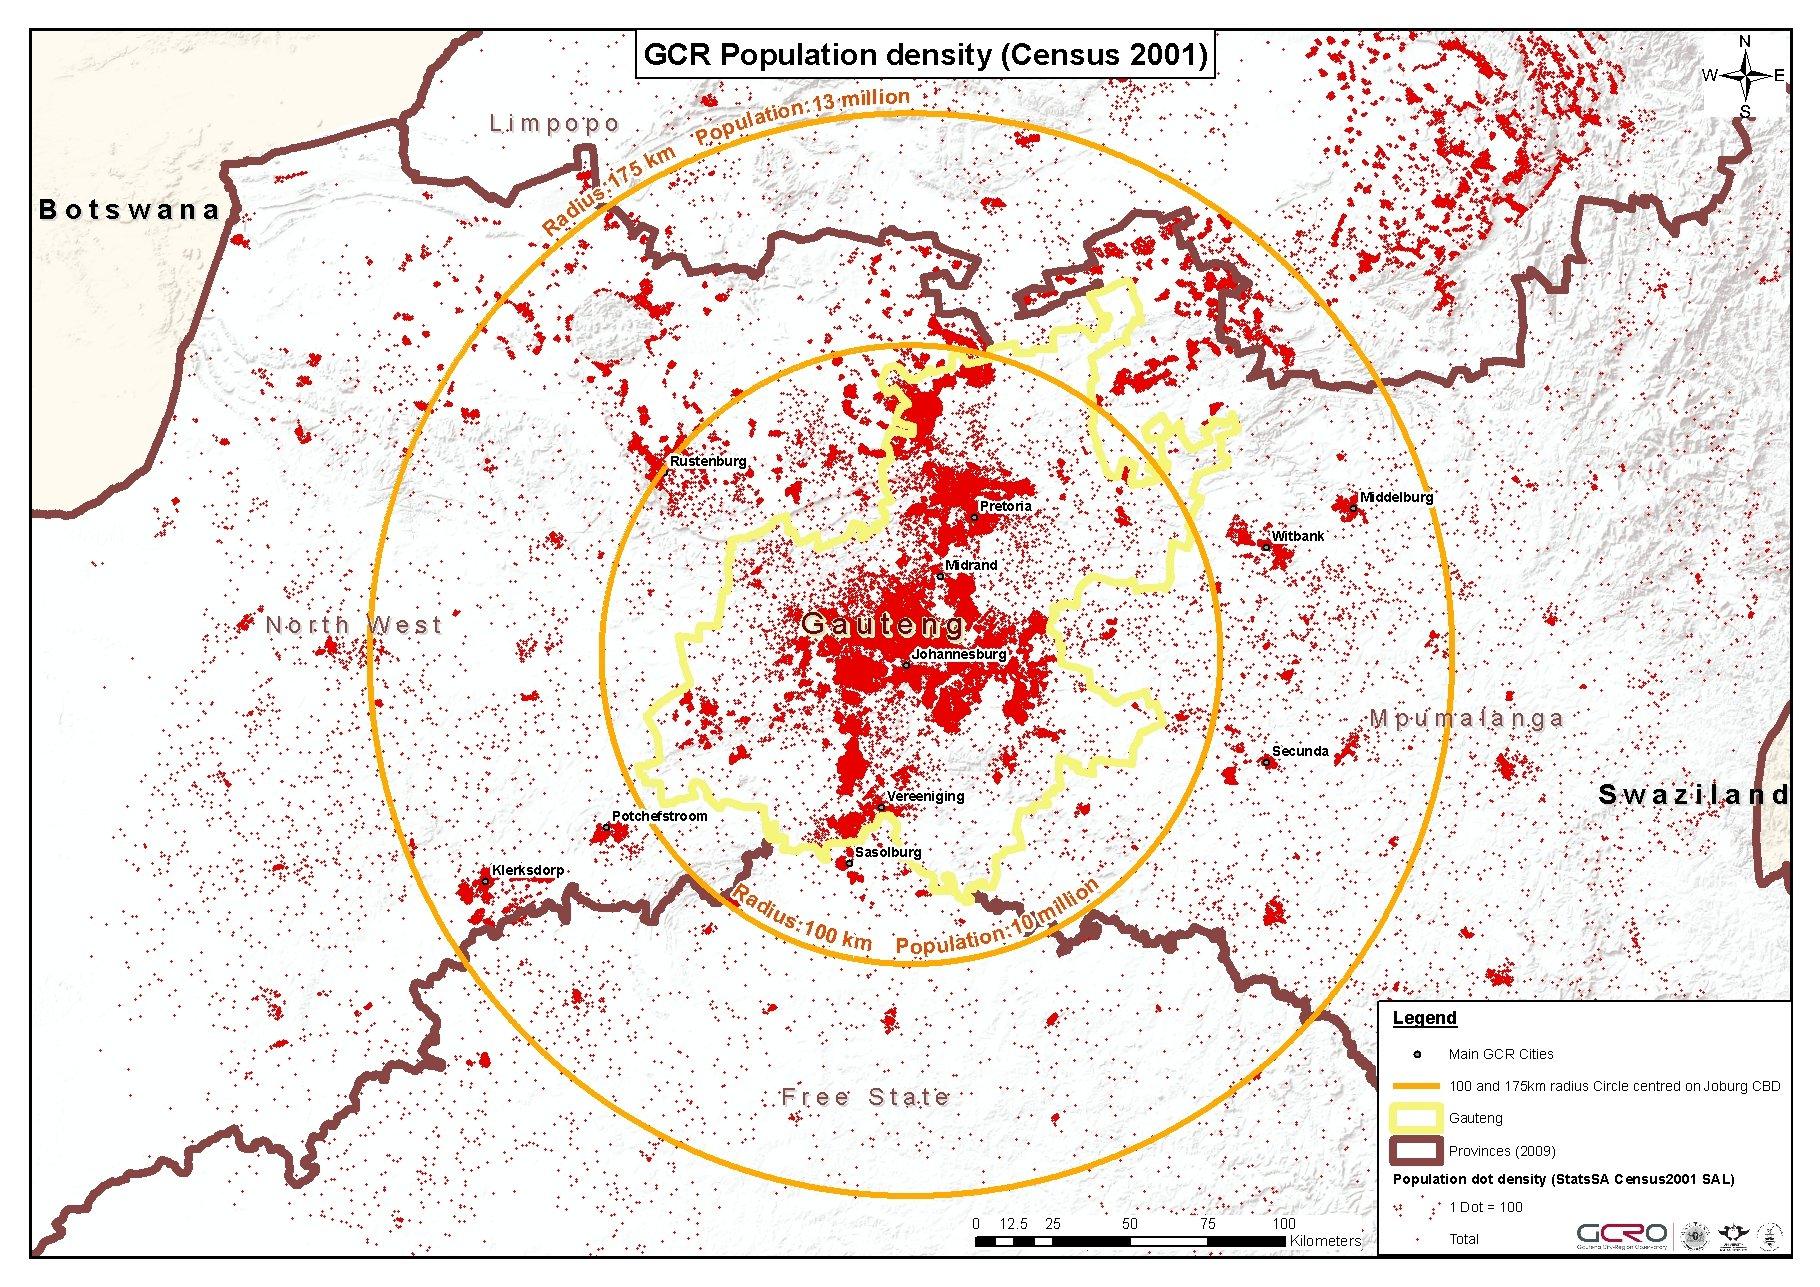 GCRO_footprint_census2001_small_area_statistics_Population_GCR_dot_density_with_radius_v2